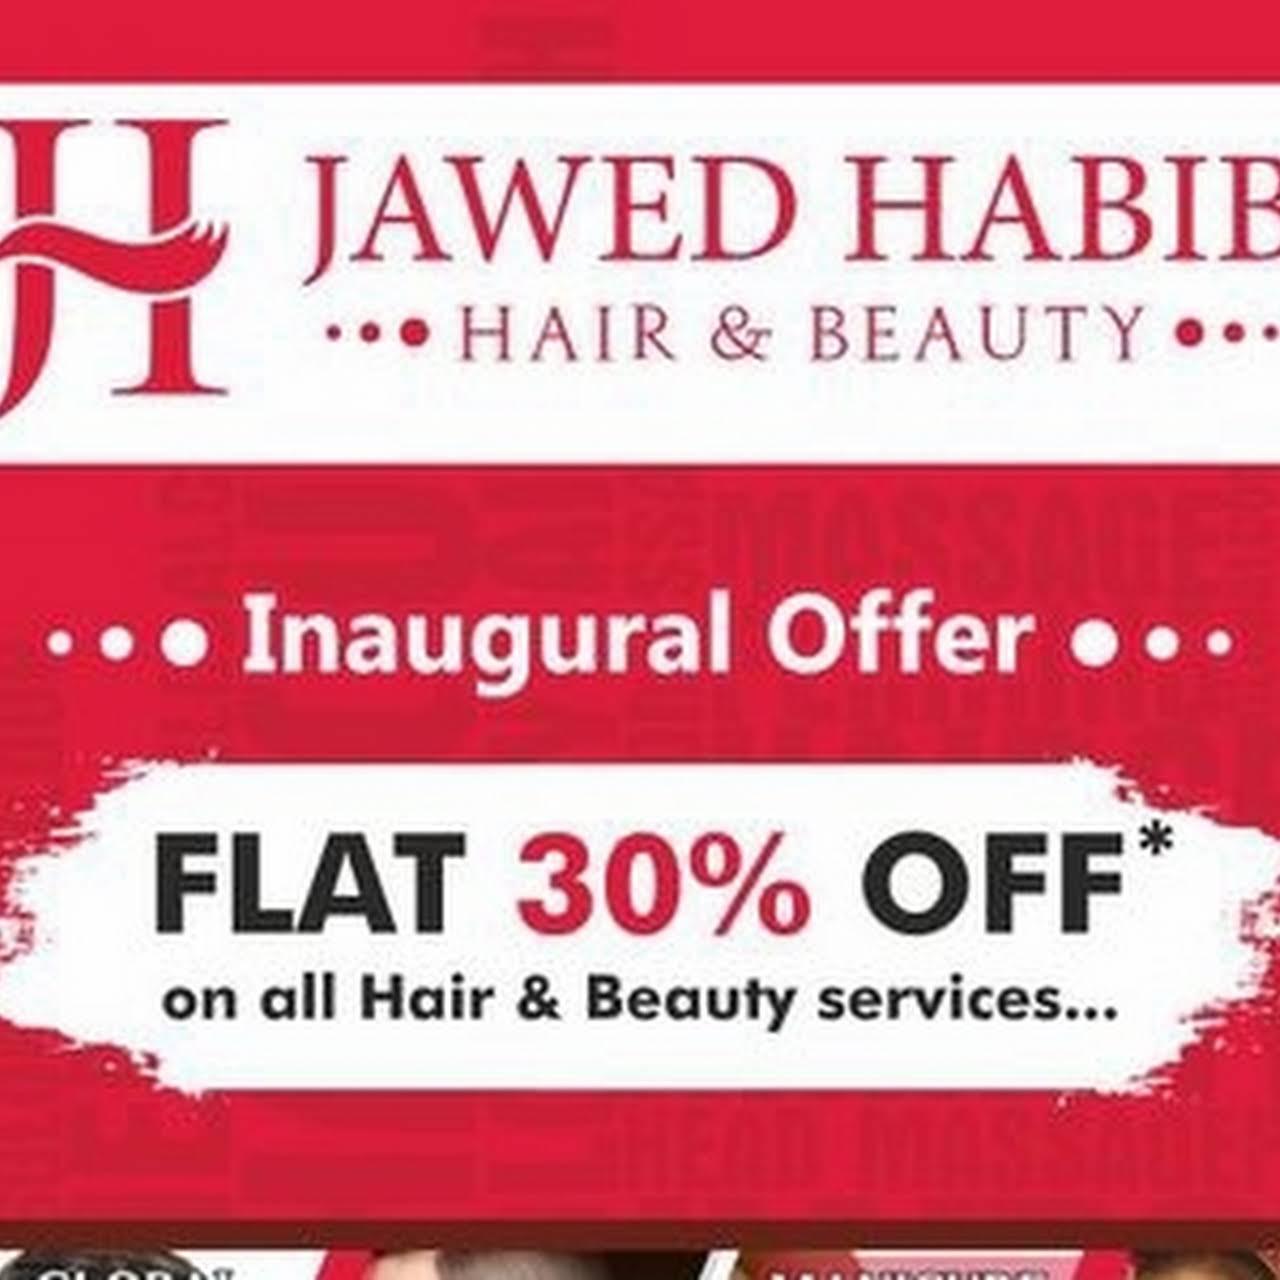 Jawed Habib Hair Beauty Ltd Narendrapur Beauty Salon In Kolkata